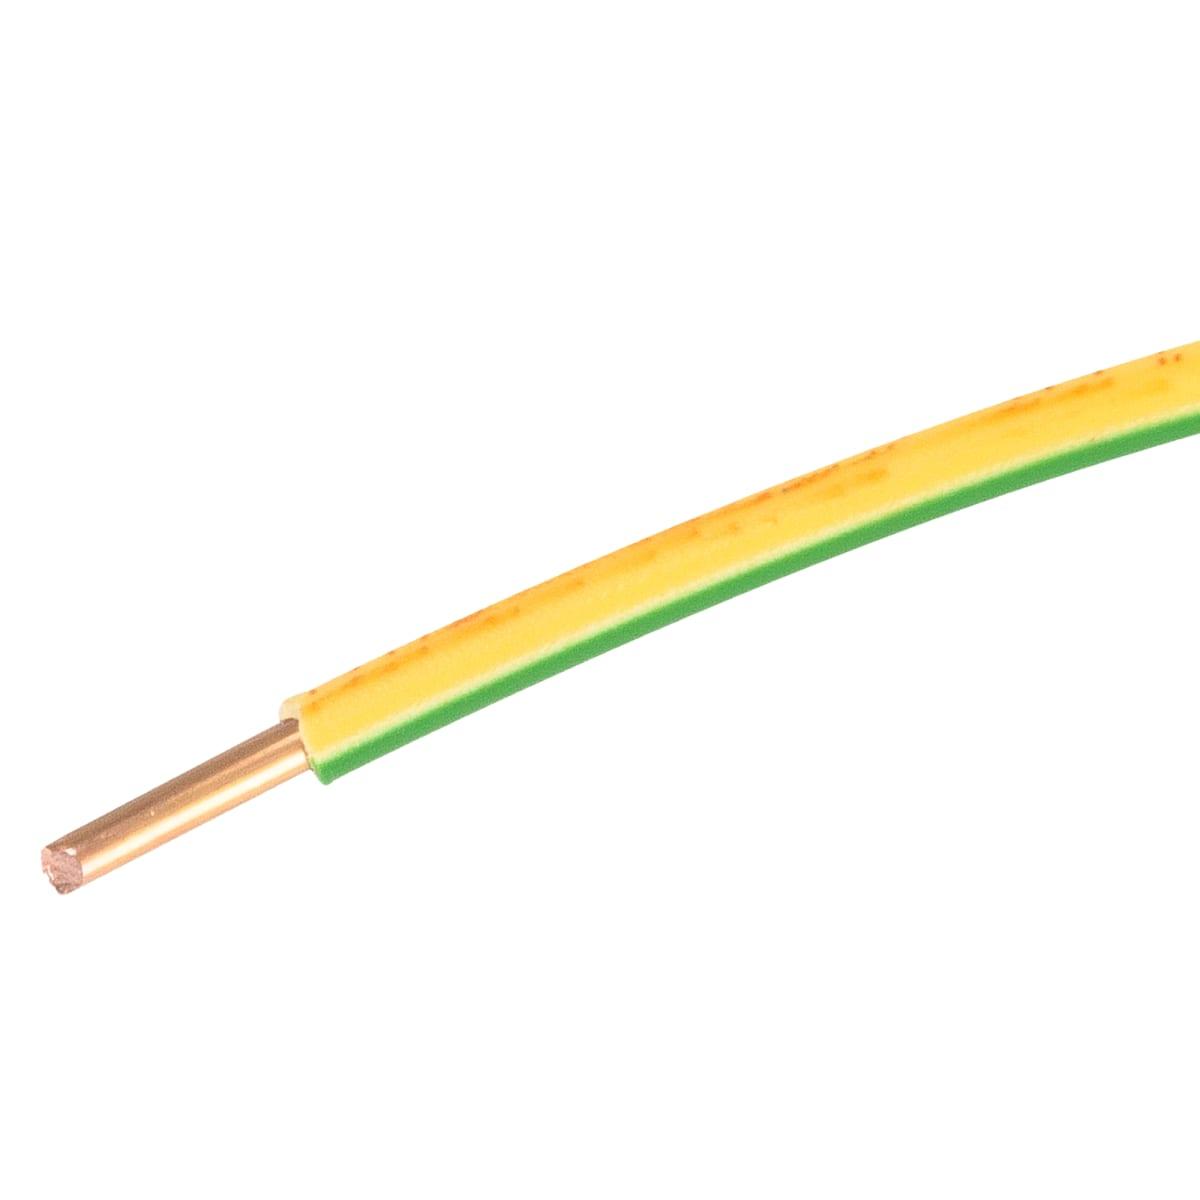 Провод Ореол ПуВ 1x2.5, на отрез, цвет жёлто-зелёный